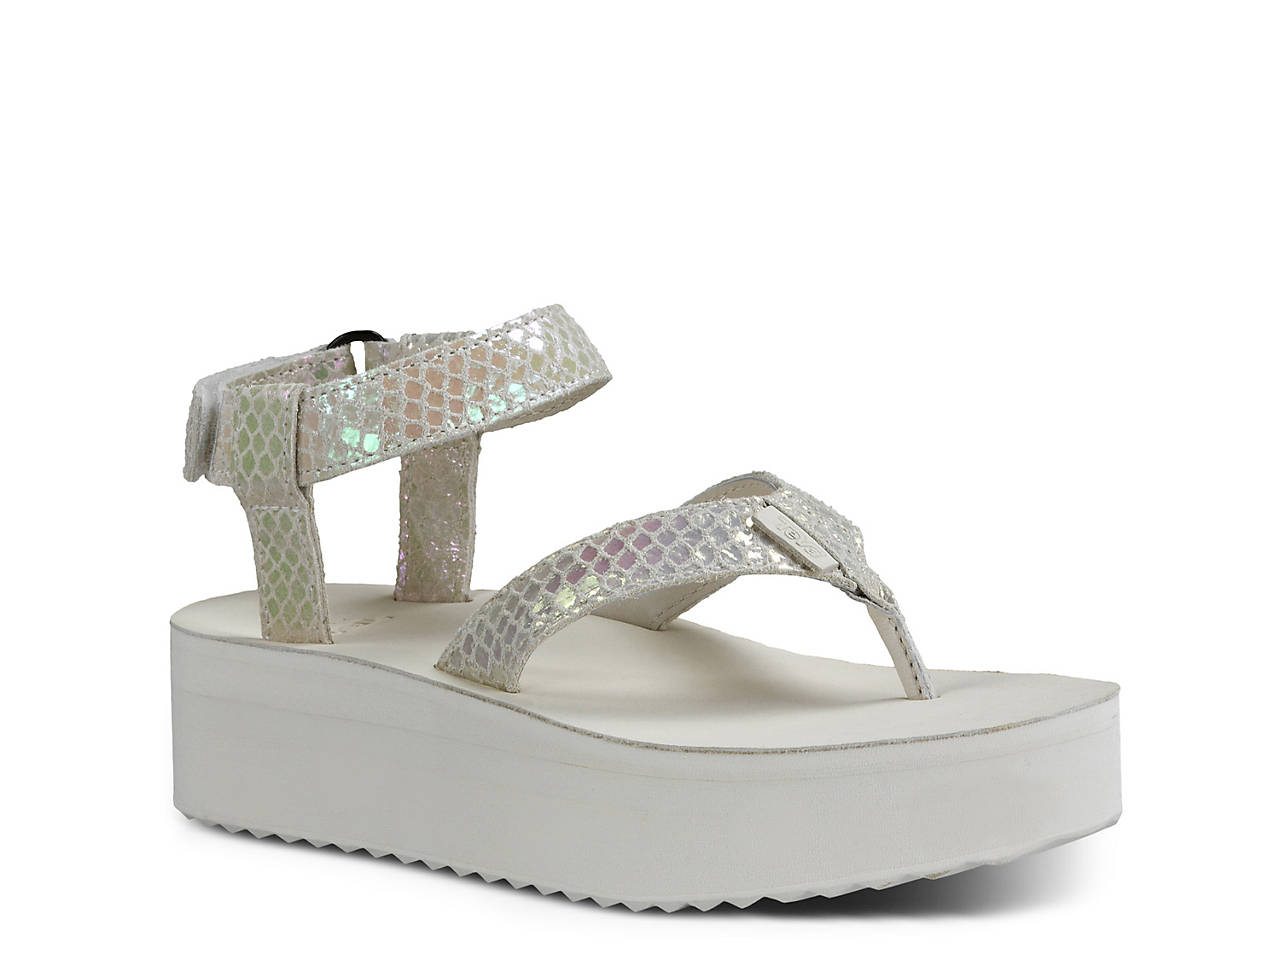 fad7cd40e05b Teva Flatform Universal Iridescent Sandal Women s Shoes